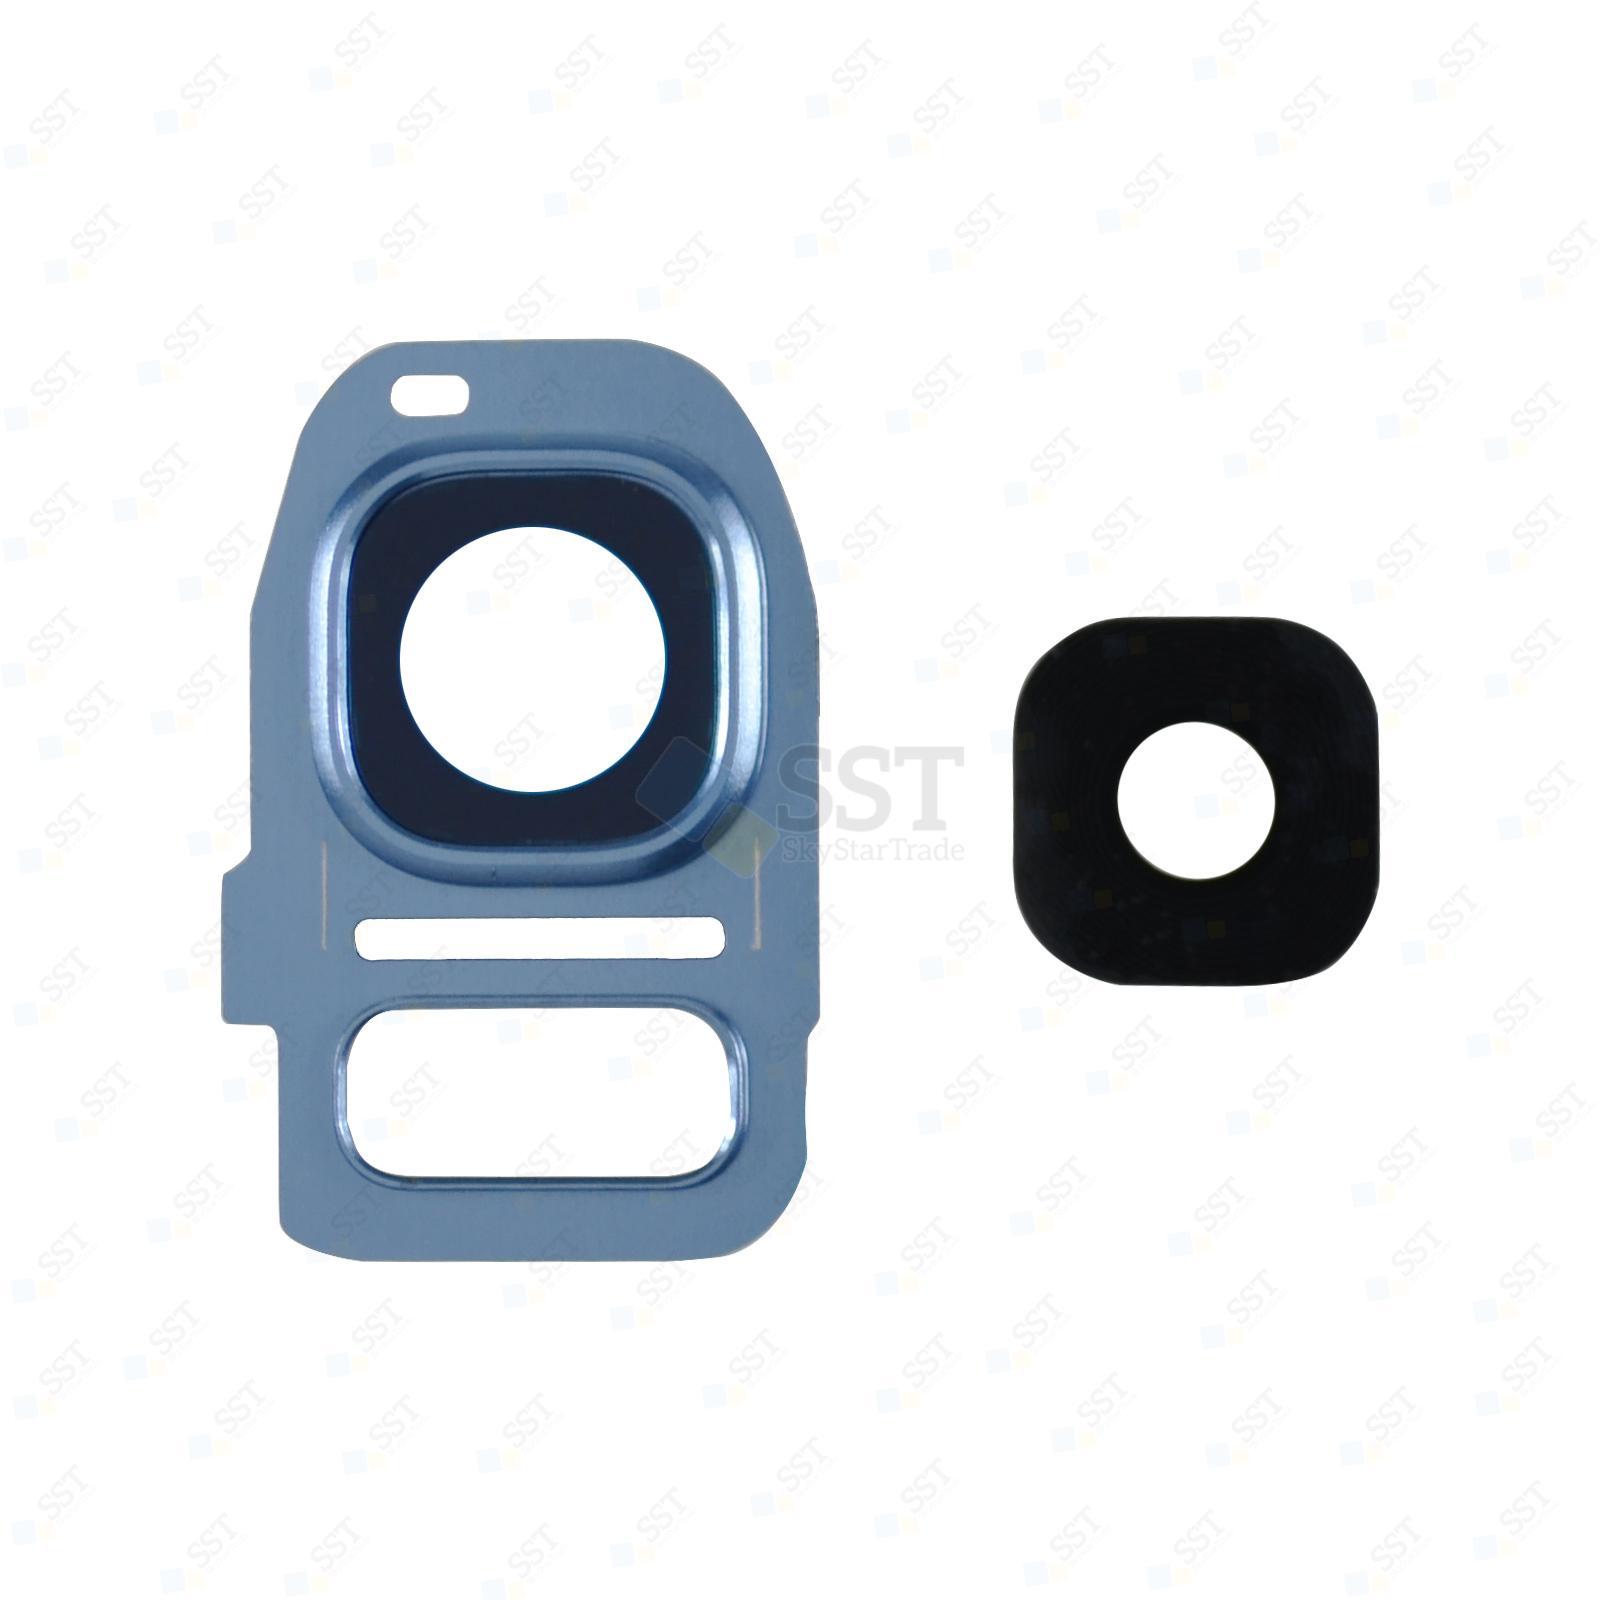 Samsung Galaxy S7 G930 G930F G930A G930V G930P G930T G930R4 G930W8, Edge G935 G935F G935A G935V G935P G935T G935R4 G935W8 Camera Lens with Bezel Frame, Blue